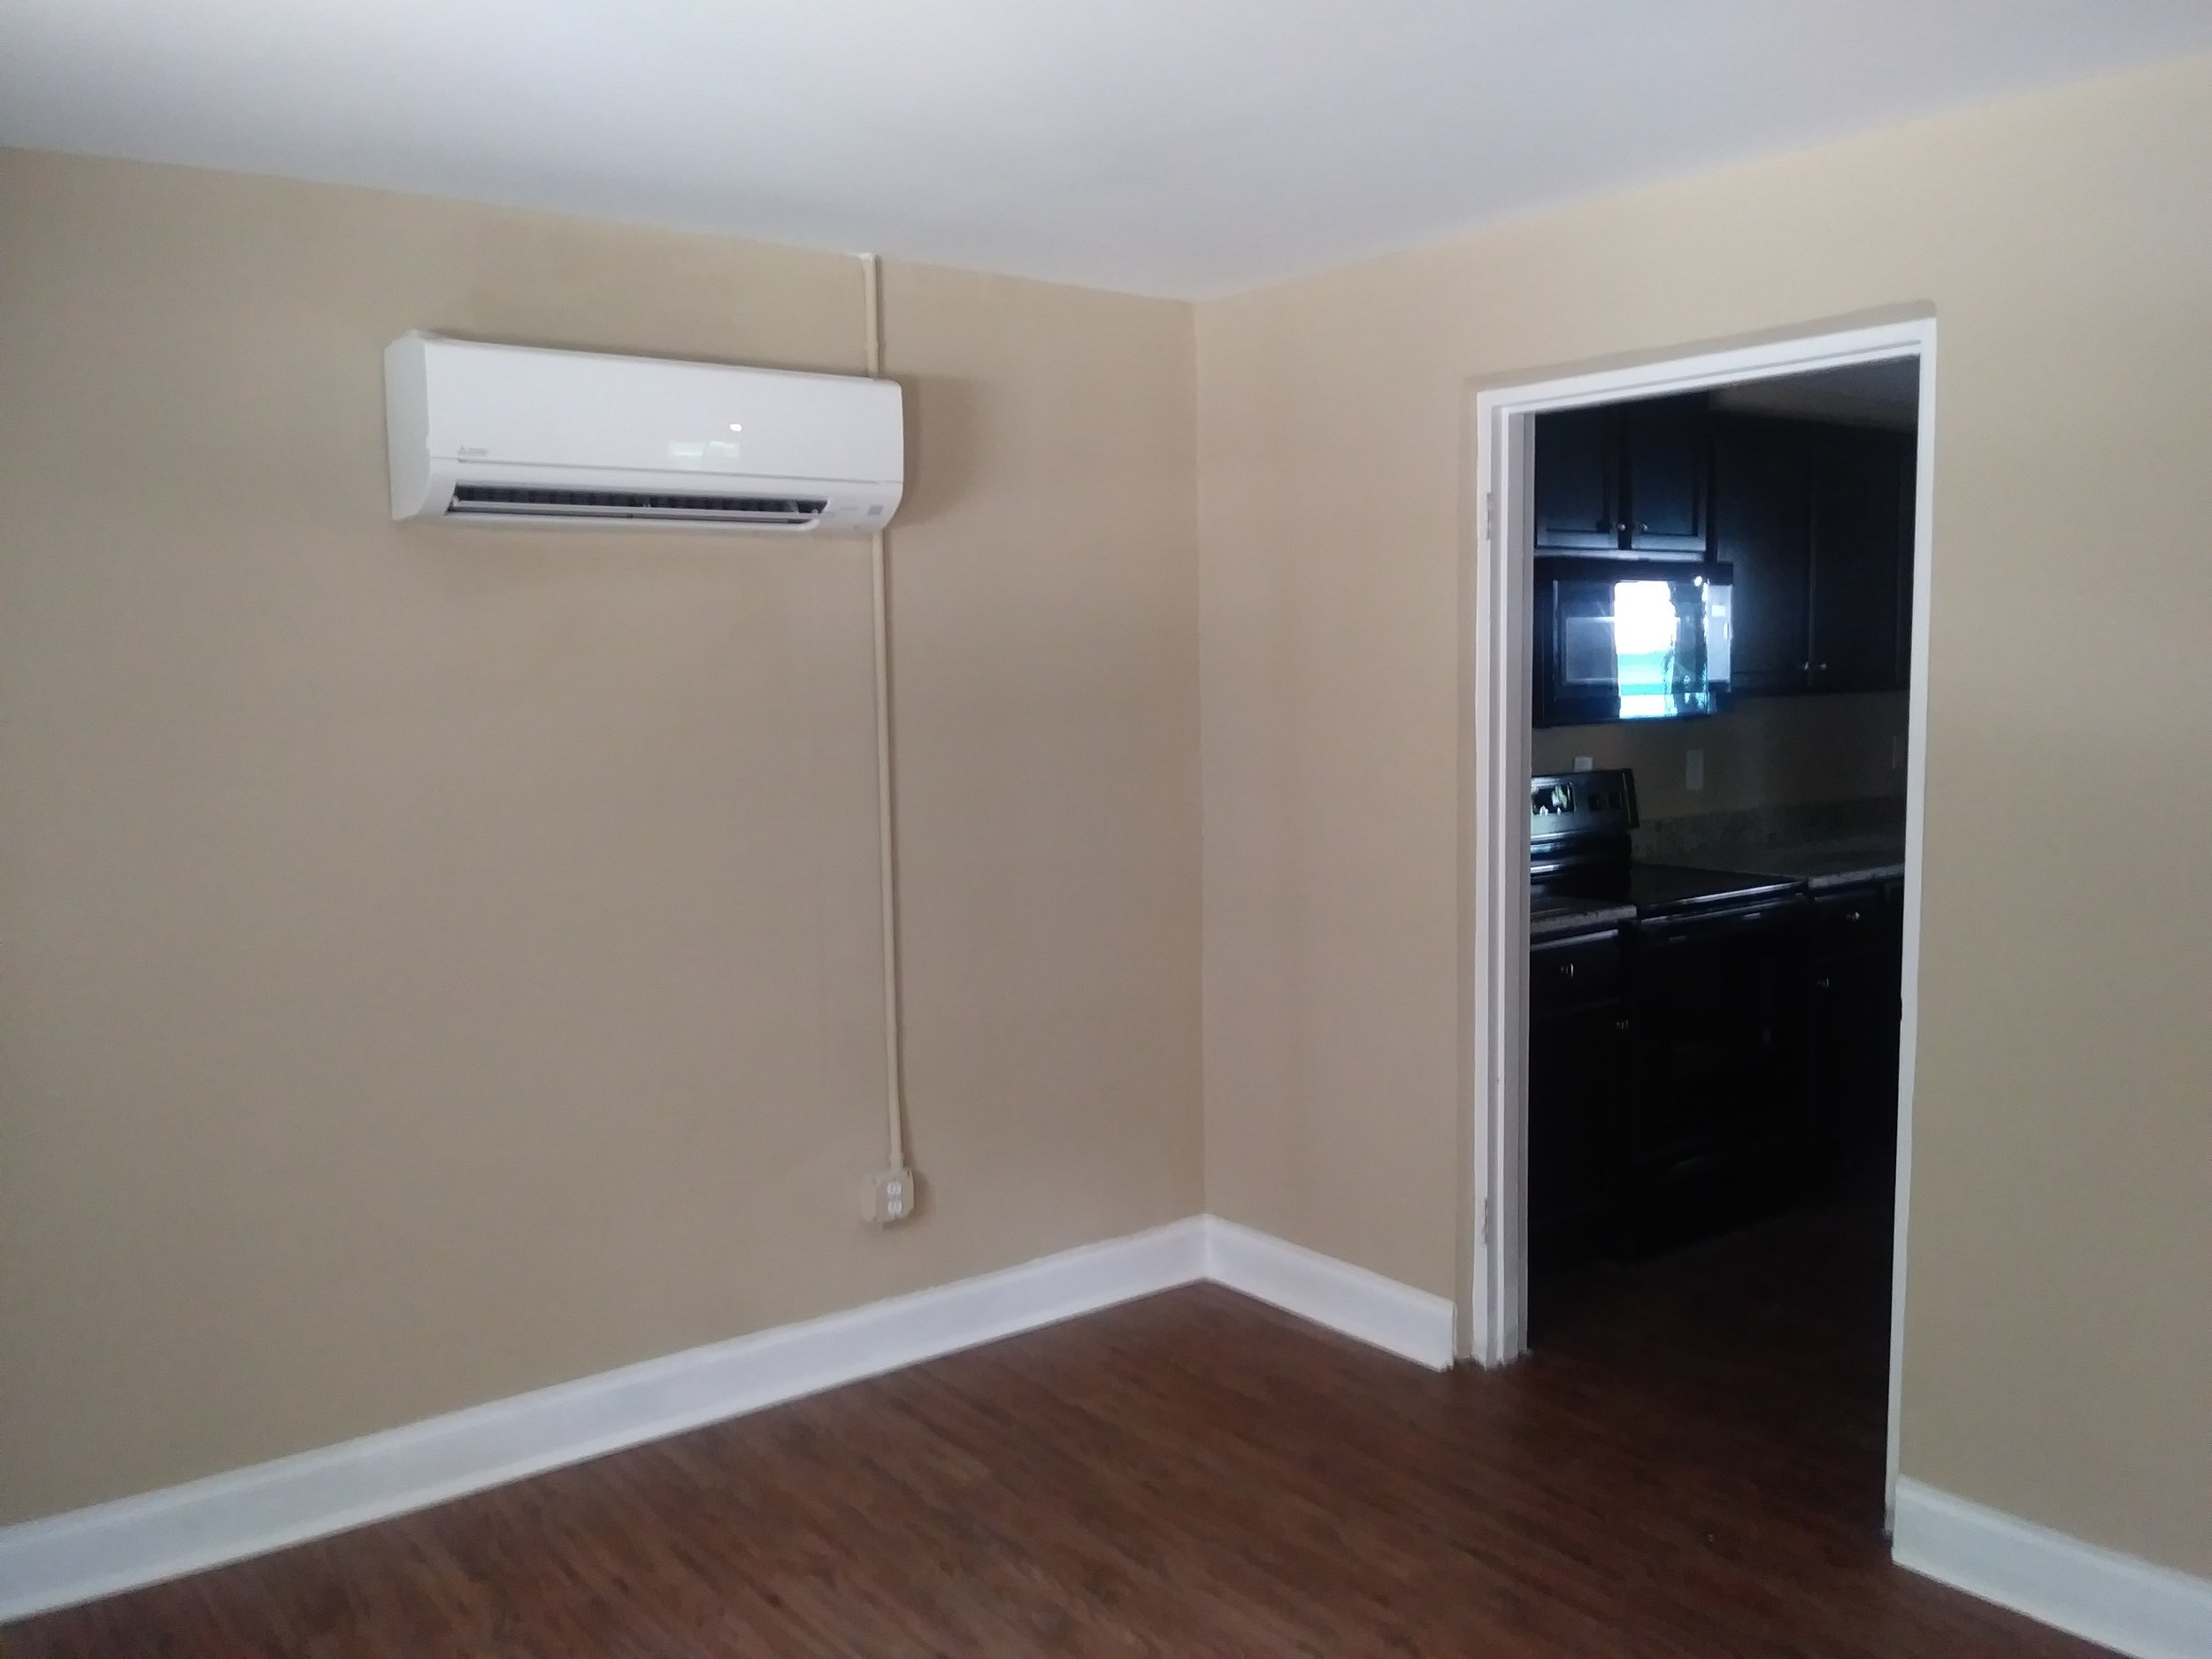 Isley Street, 103-B Wall Conditioner Unit in LR.jpg